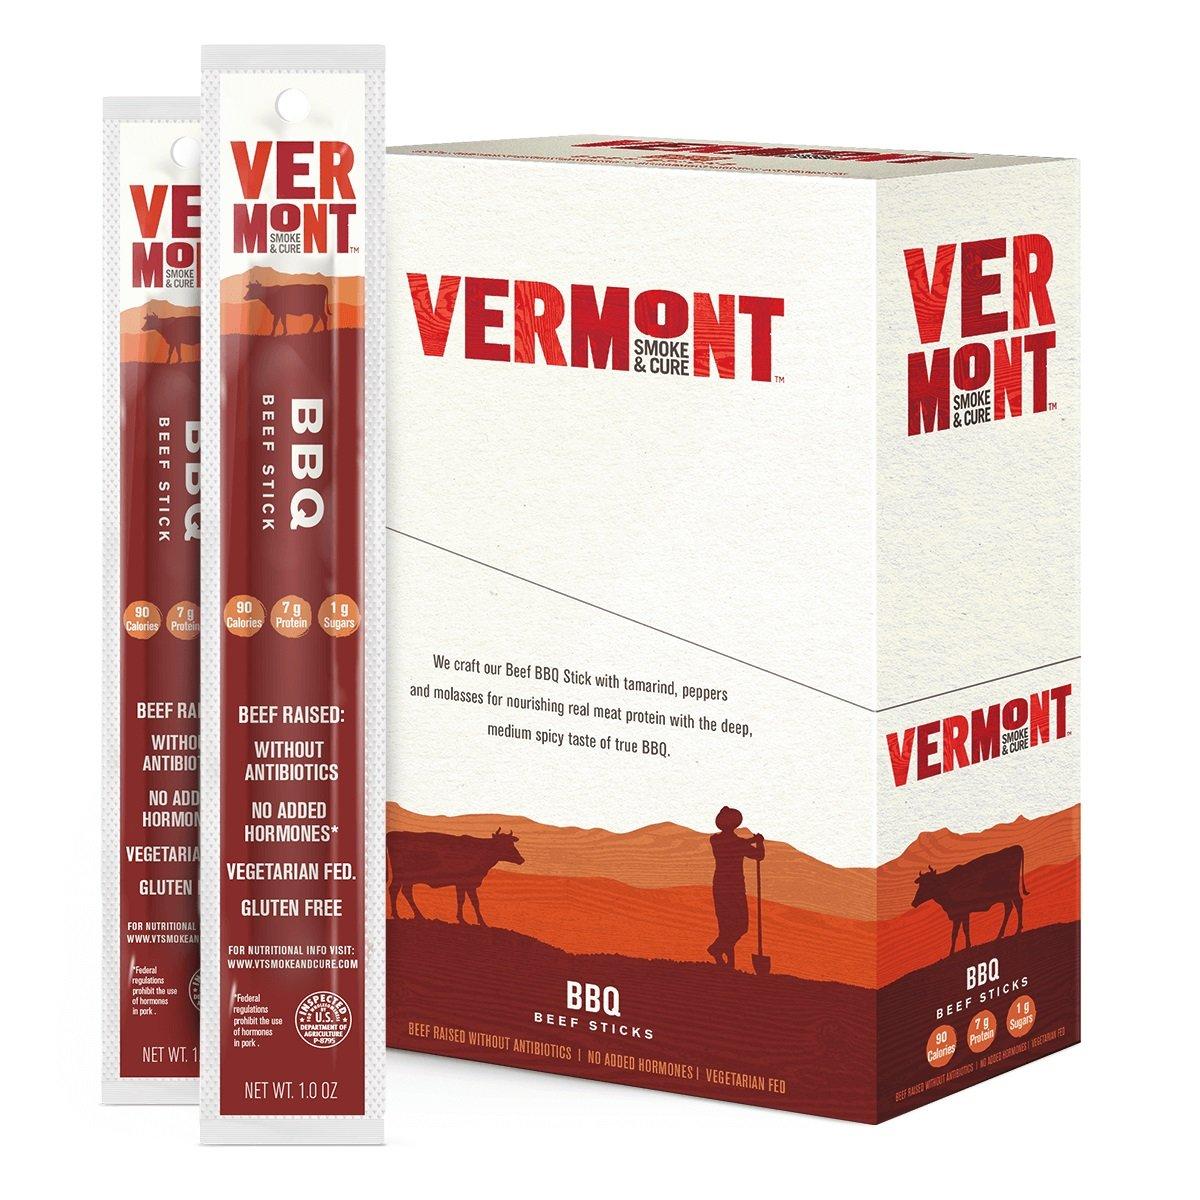 Vermont Smoke & Cure Meat Sticks - Antibiotic Free Beef Jerky Sticks - Gluten Free - Paleo & Keto Approved - BBQ - 1oz Stick -24 Count